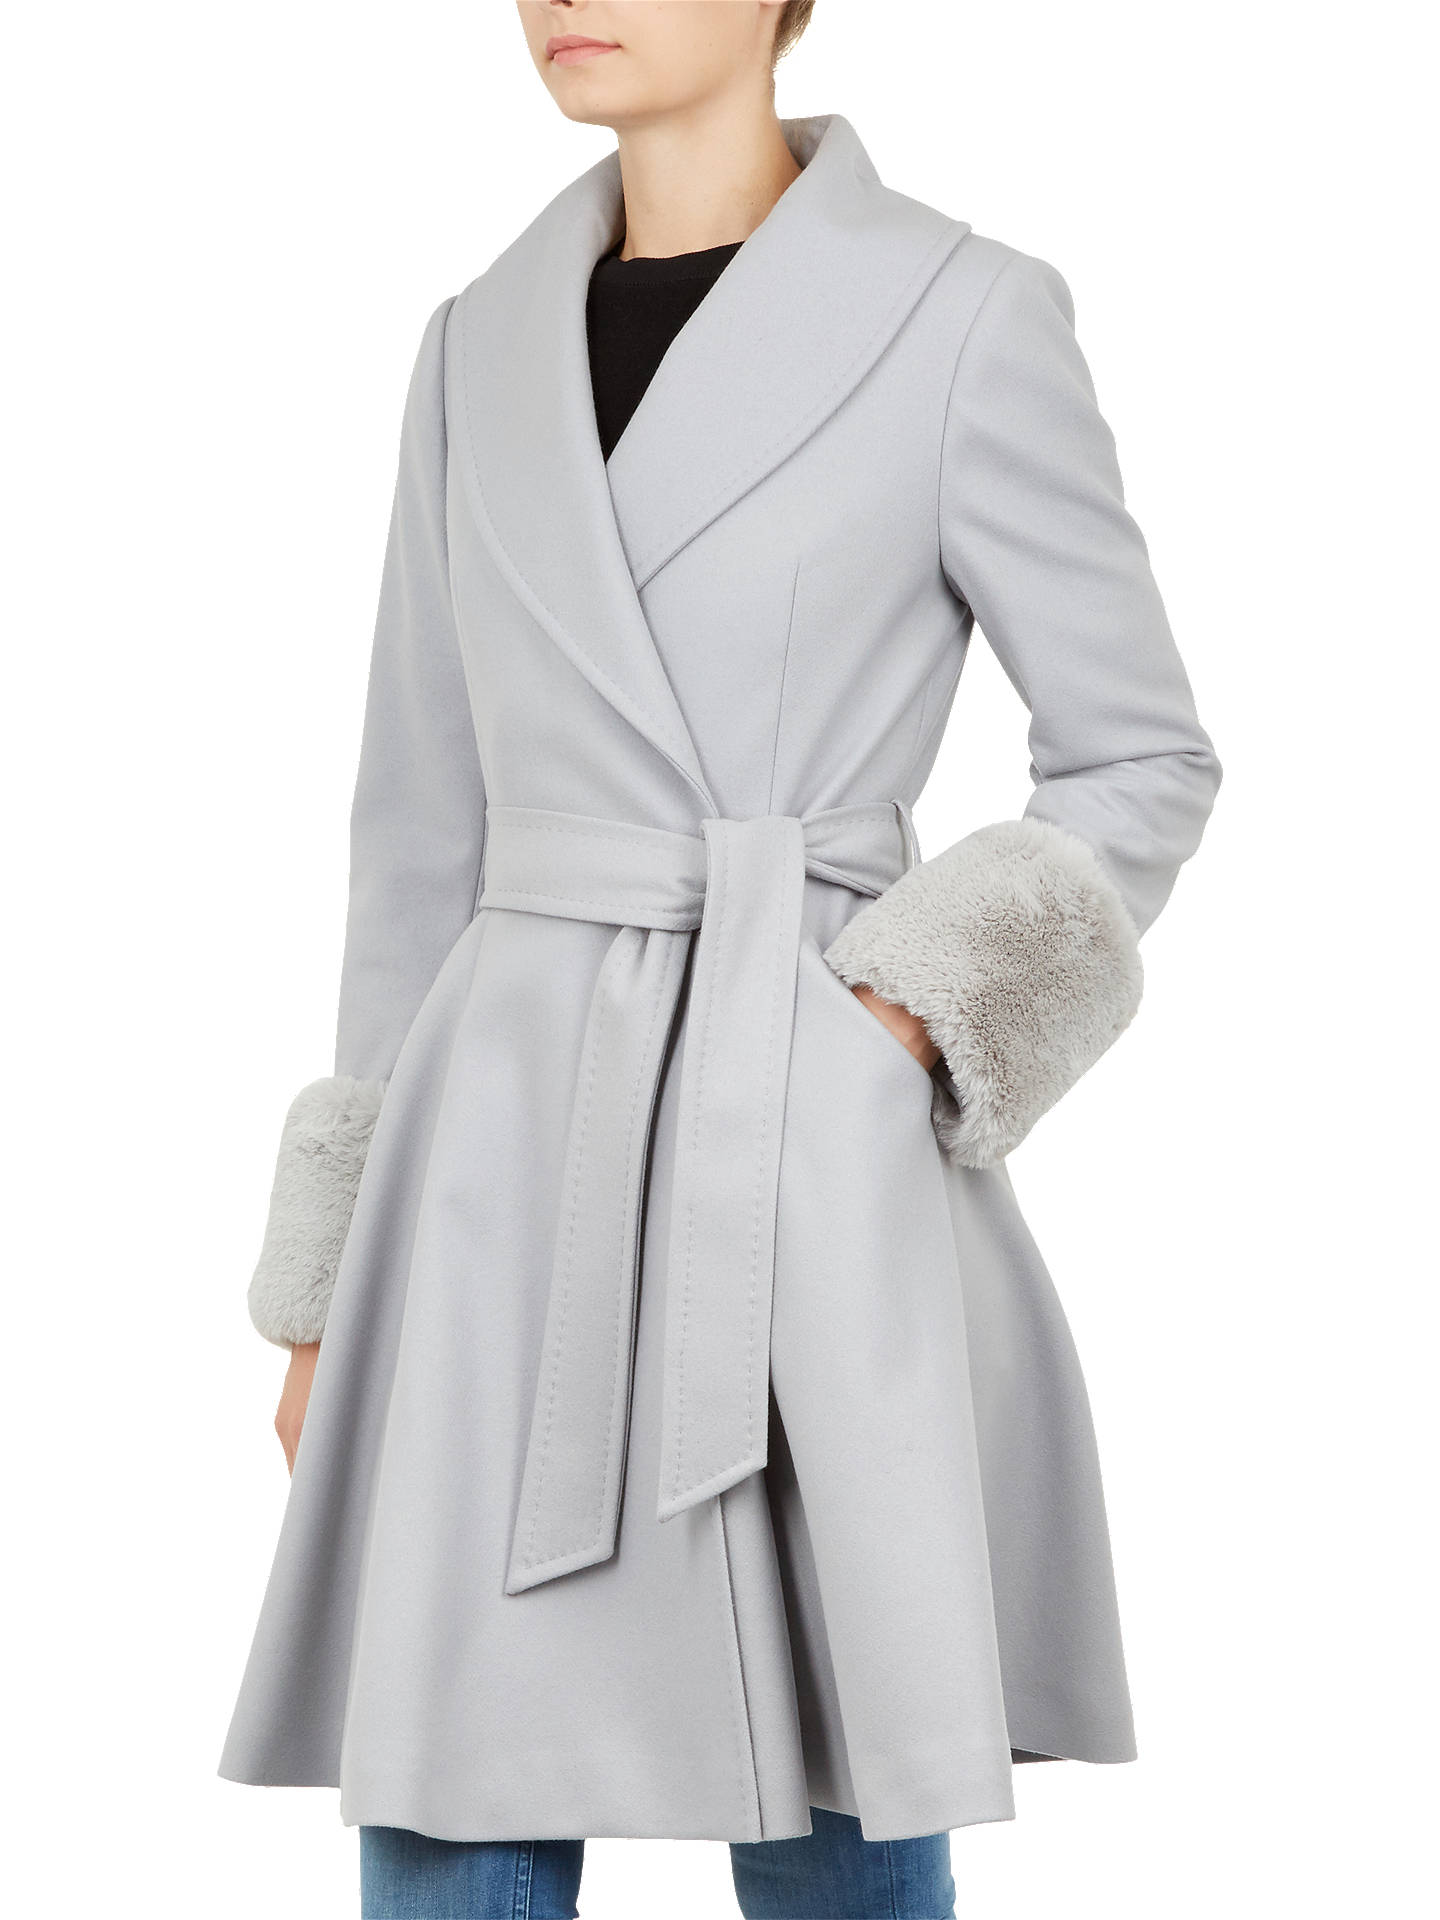 6ec26635b Buy Ted Baker Zurii Faux Fur Cuff Coat